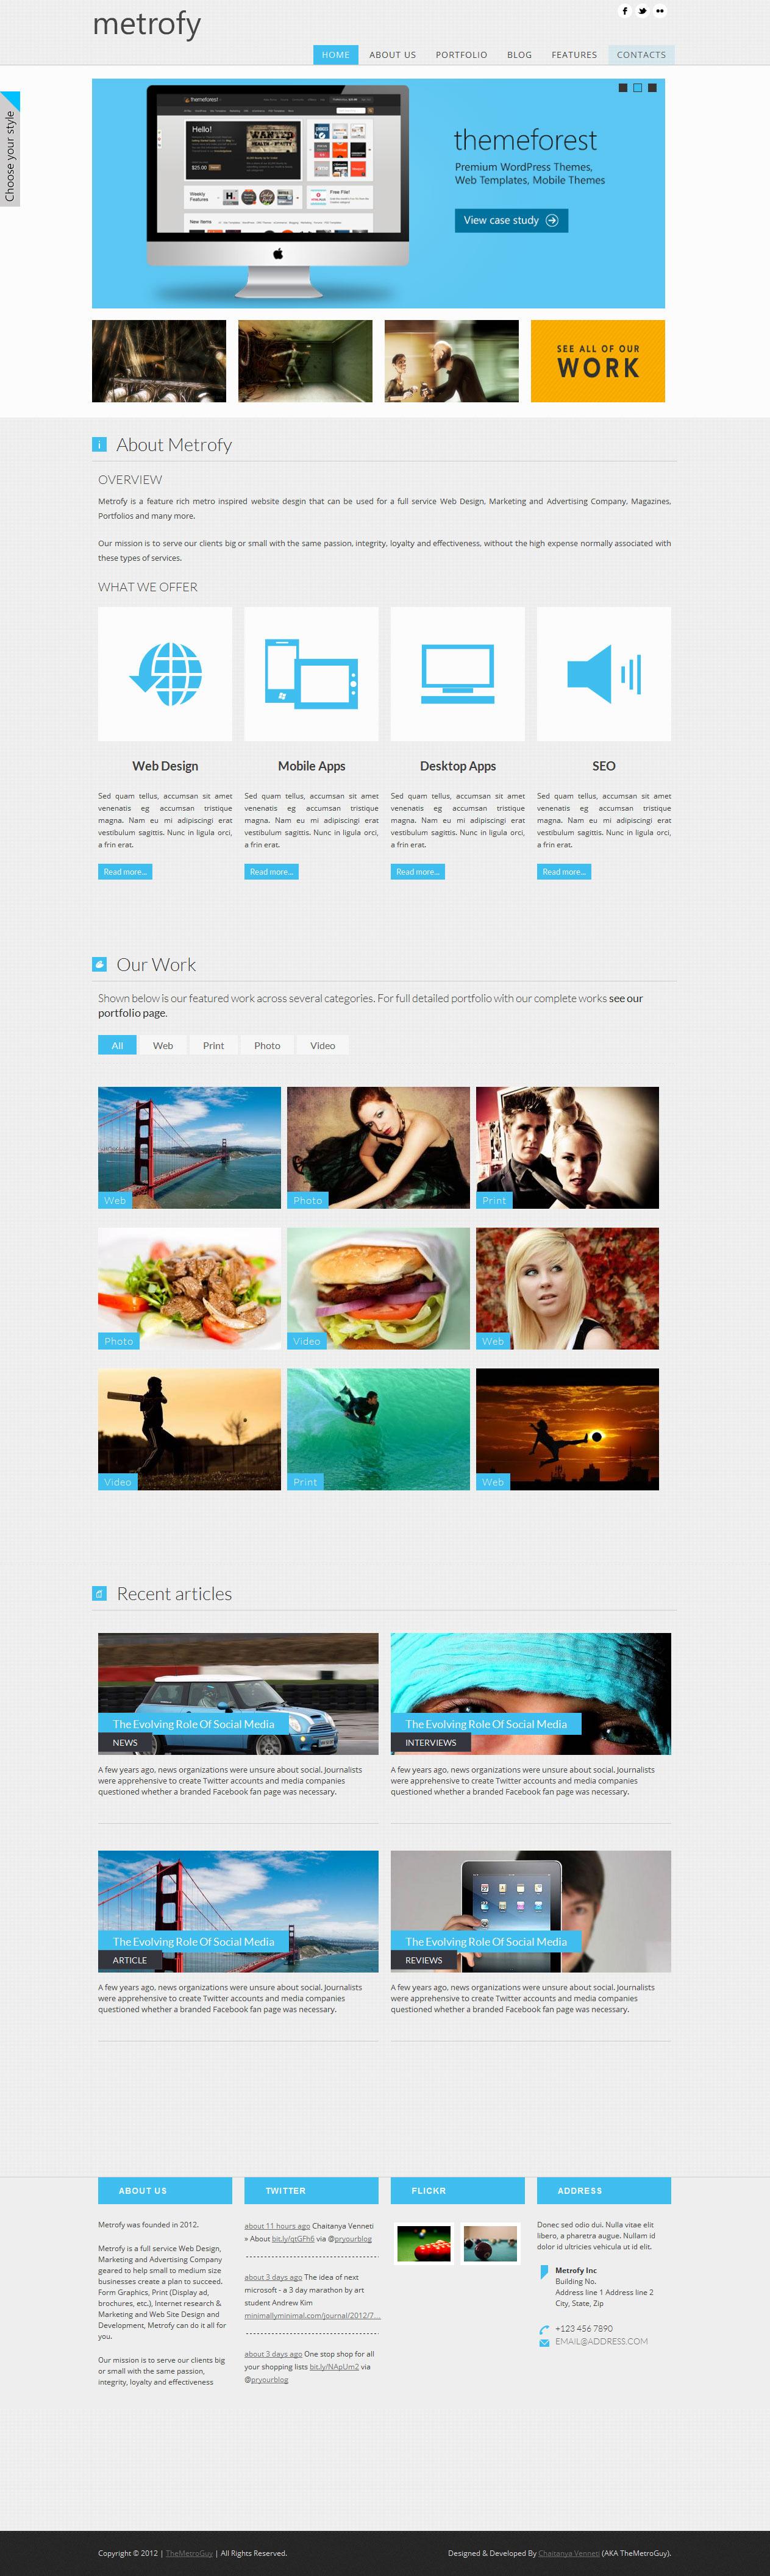 Metrofy Wordpress Theme in Metro Style #wordpress #theme #website ...